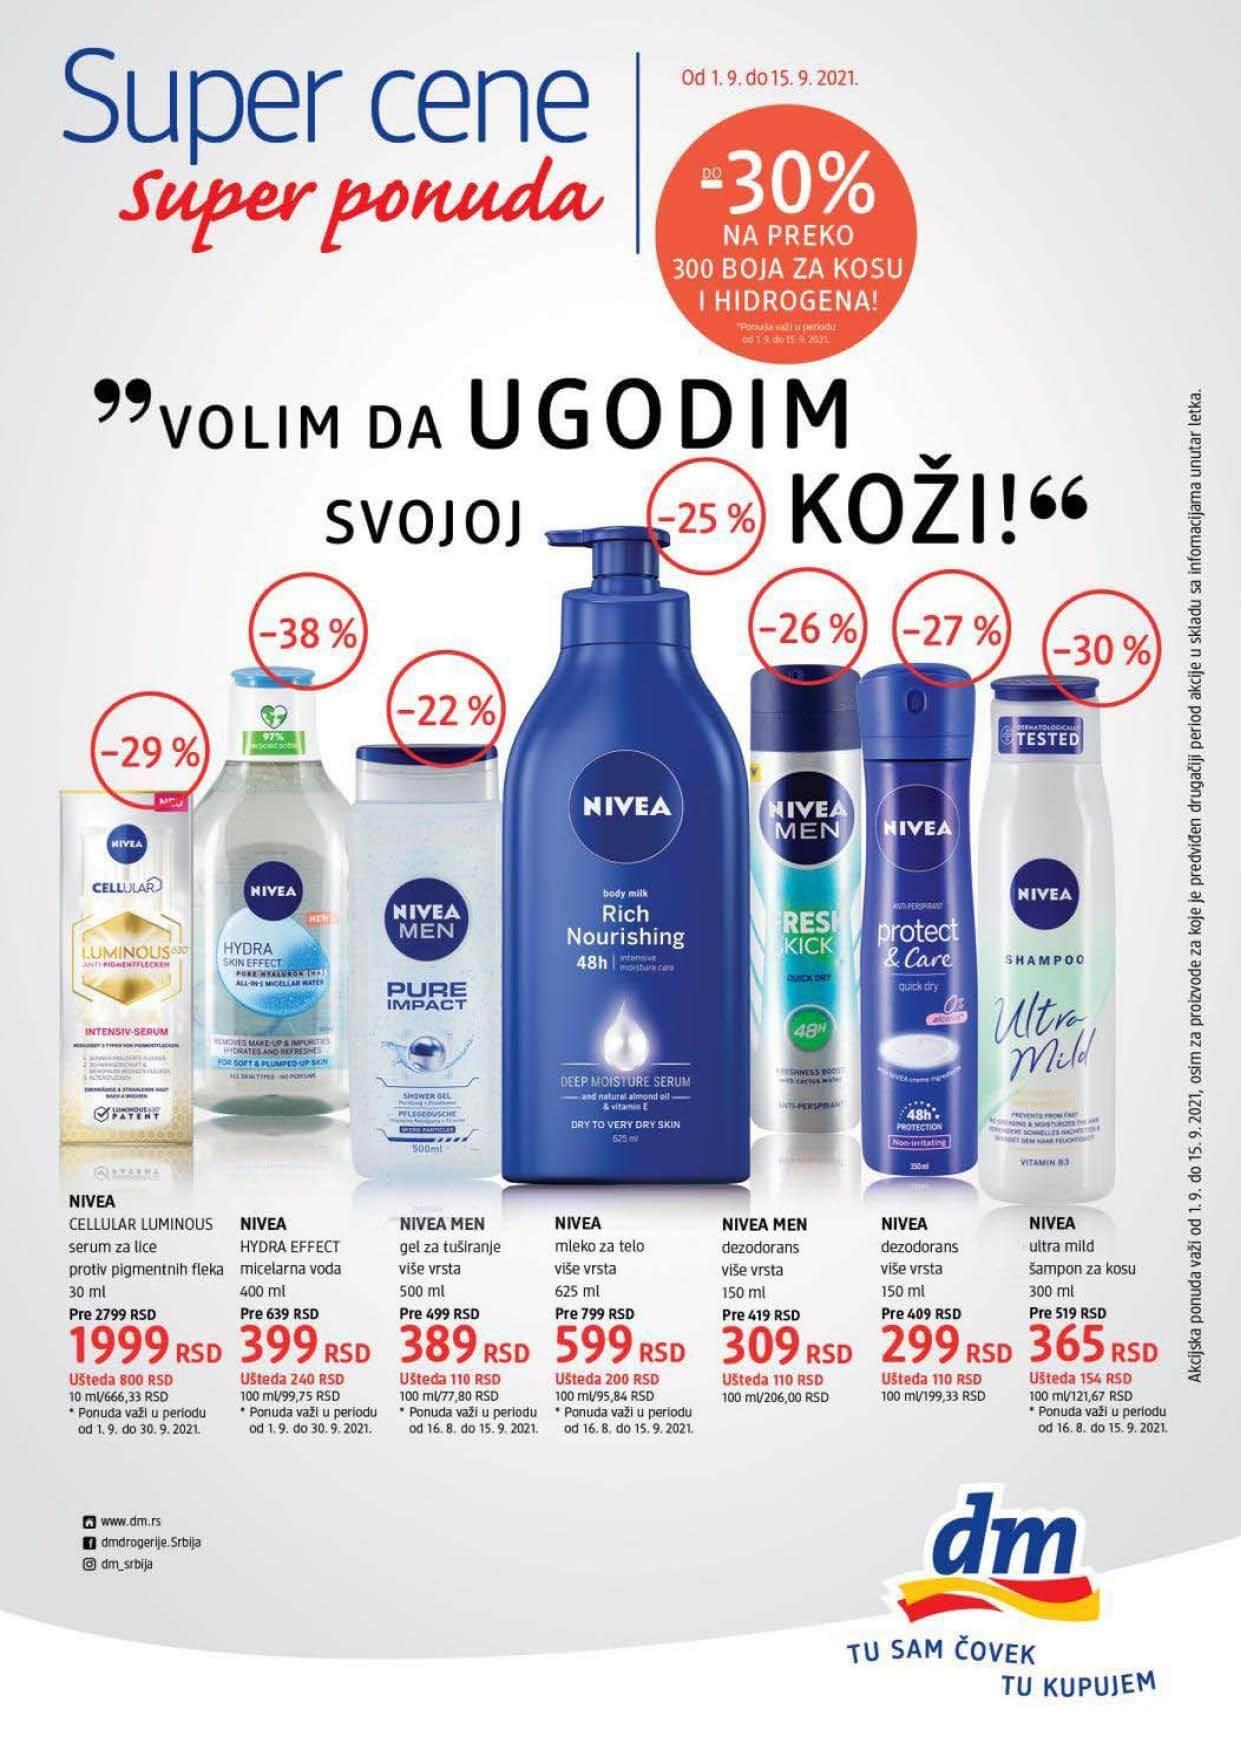 DM SUPER CENE Srbija Septembar 2021 1.9.2021. 15.9.2021. Page 1